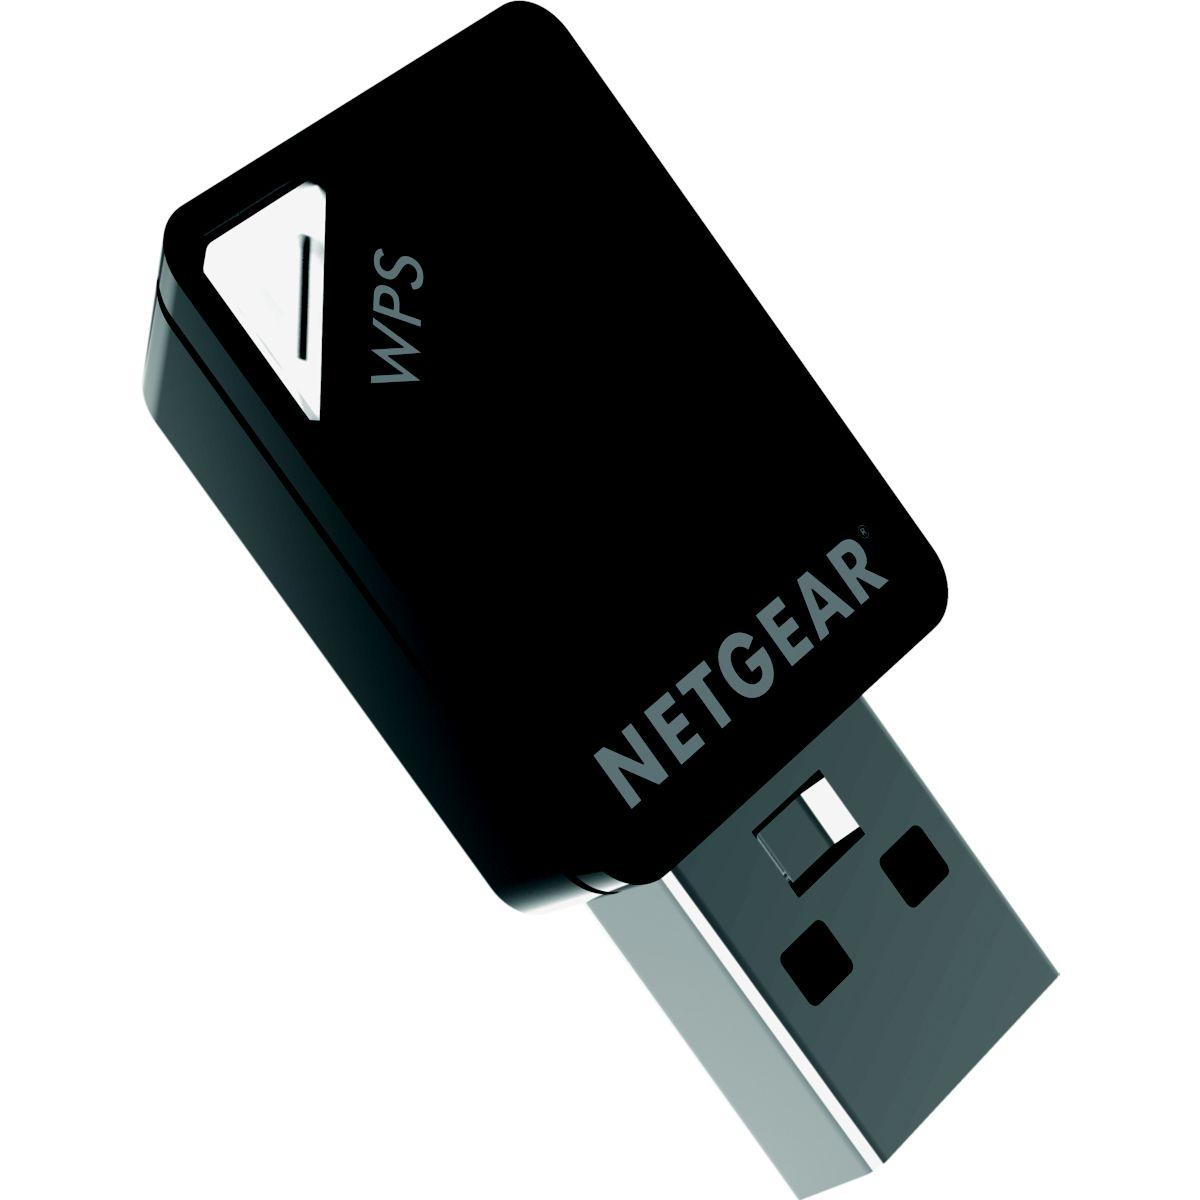 Adaptateur réseau NETGEAR Wifi A6100 802.11ac AC600 (photo)